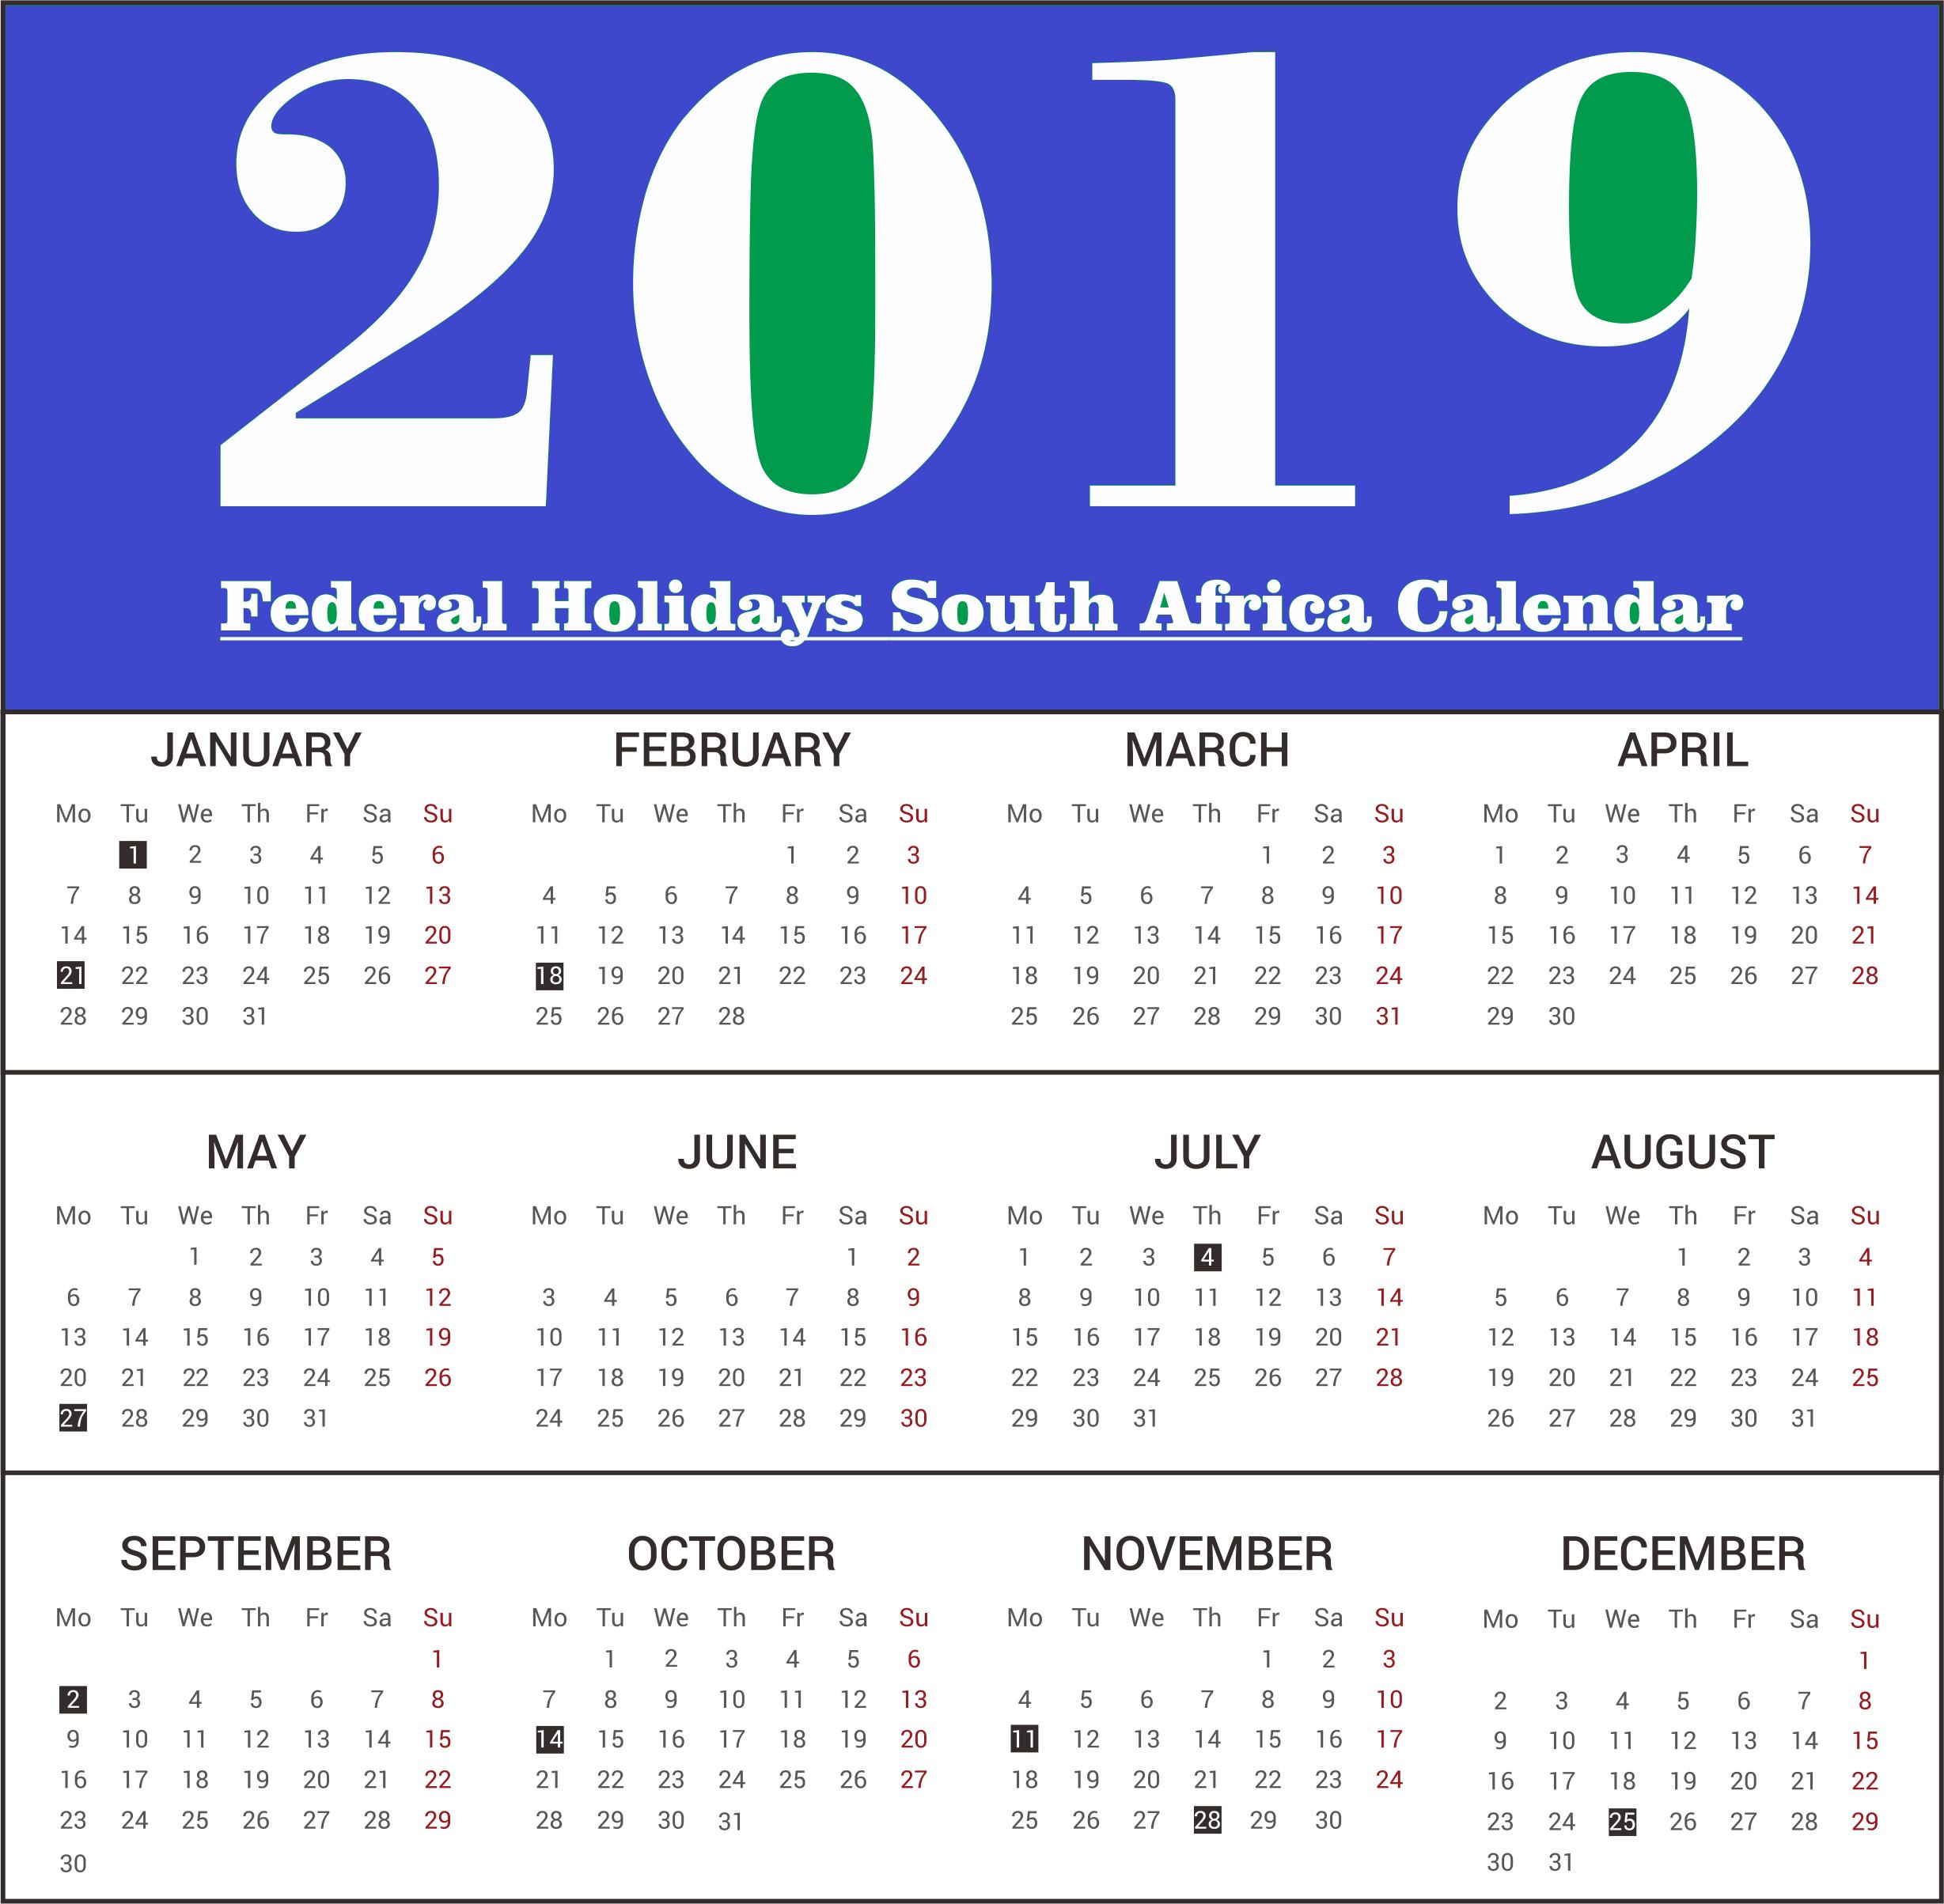 December 2020 Calendar Federalholidayscalendar 2019 South Africa Federal Holidays Calendar #southafrica #calendar